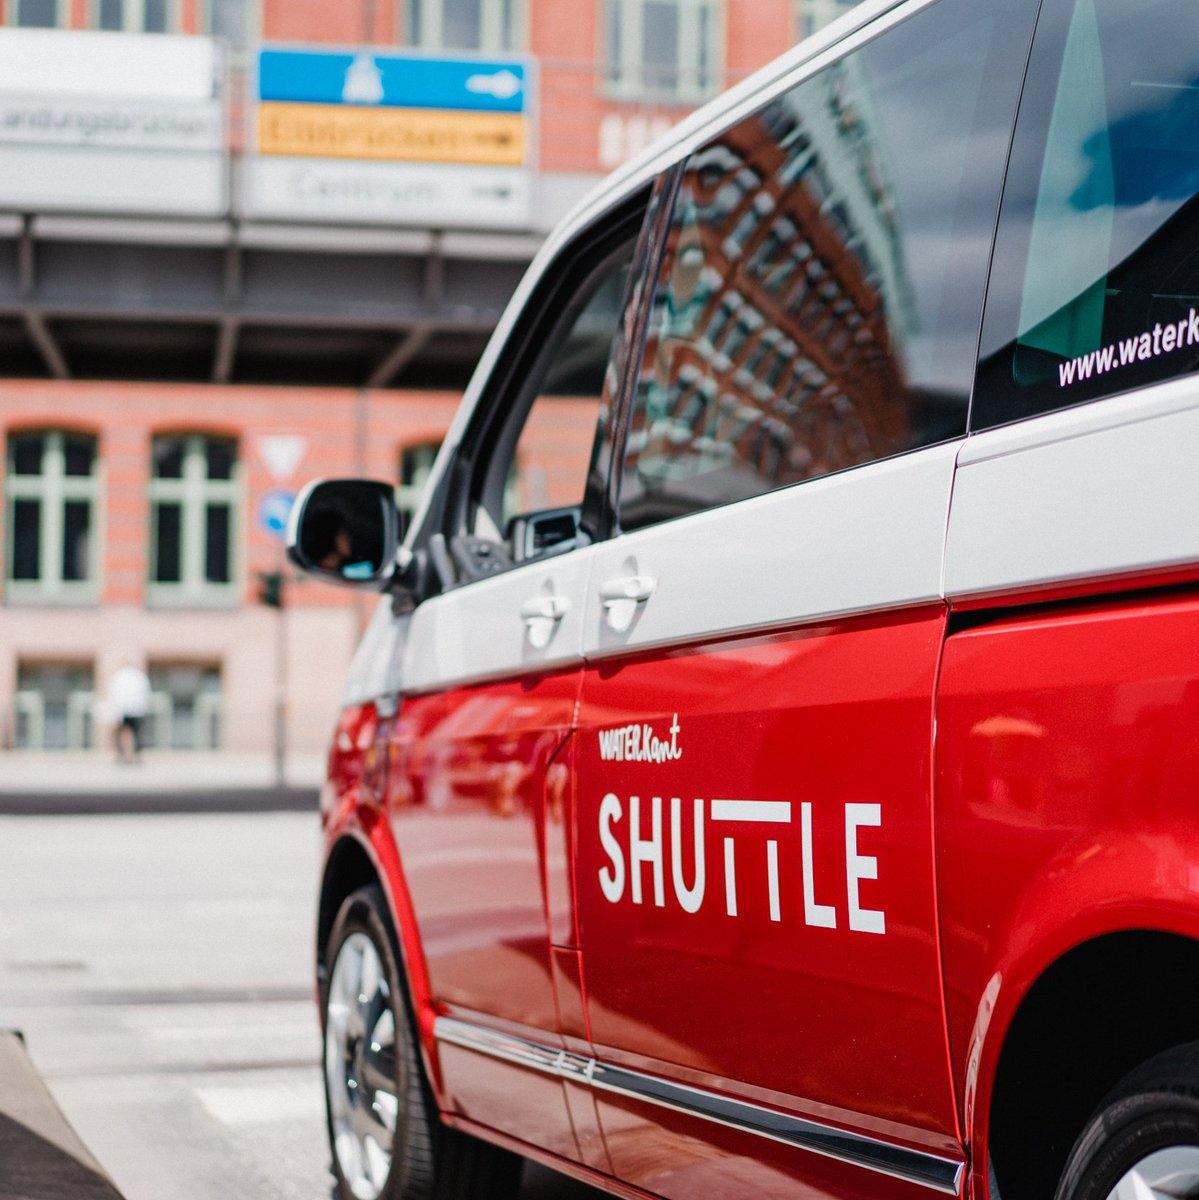 Flexibler Transport zum nächsten Event - Lasst uns wissen, wohin es geht: https://waterkant-shuttle.com _____________ #waterkantshuttle #hamburgechtbewegen #shuttle #waterkant #newworkspace #mobilität #hamburg #hh #volkswagen #vwt6 #caravelle